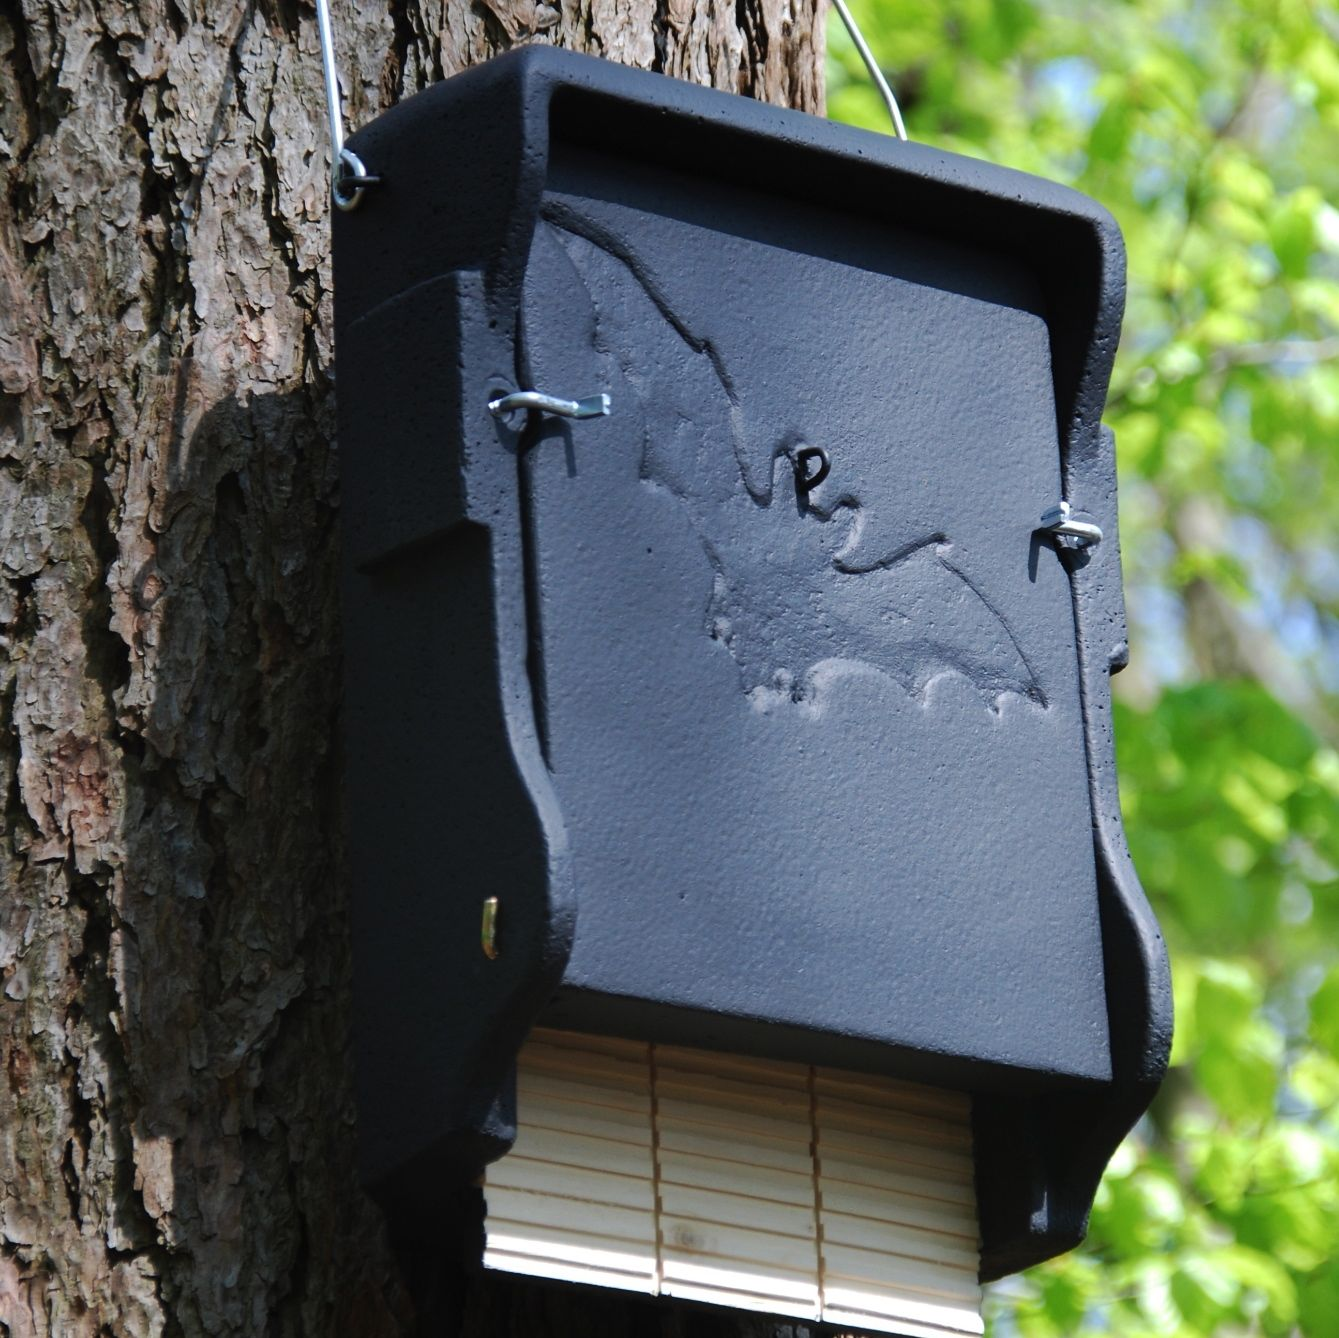 fantastisch vogeltr nke selber bauen fotos heimat ideen. Black Bedroom Furniture Sets. Home Design Ideas